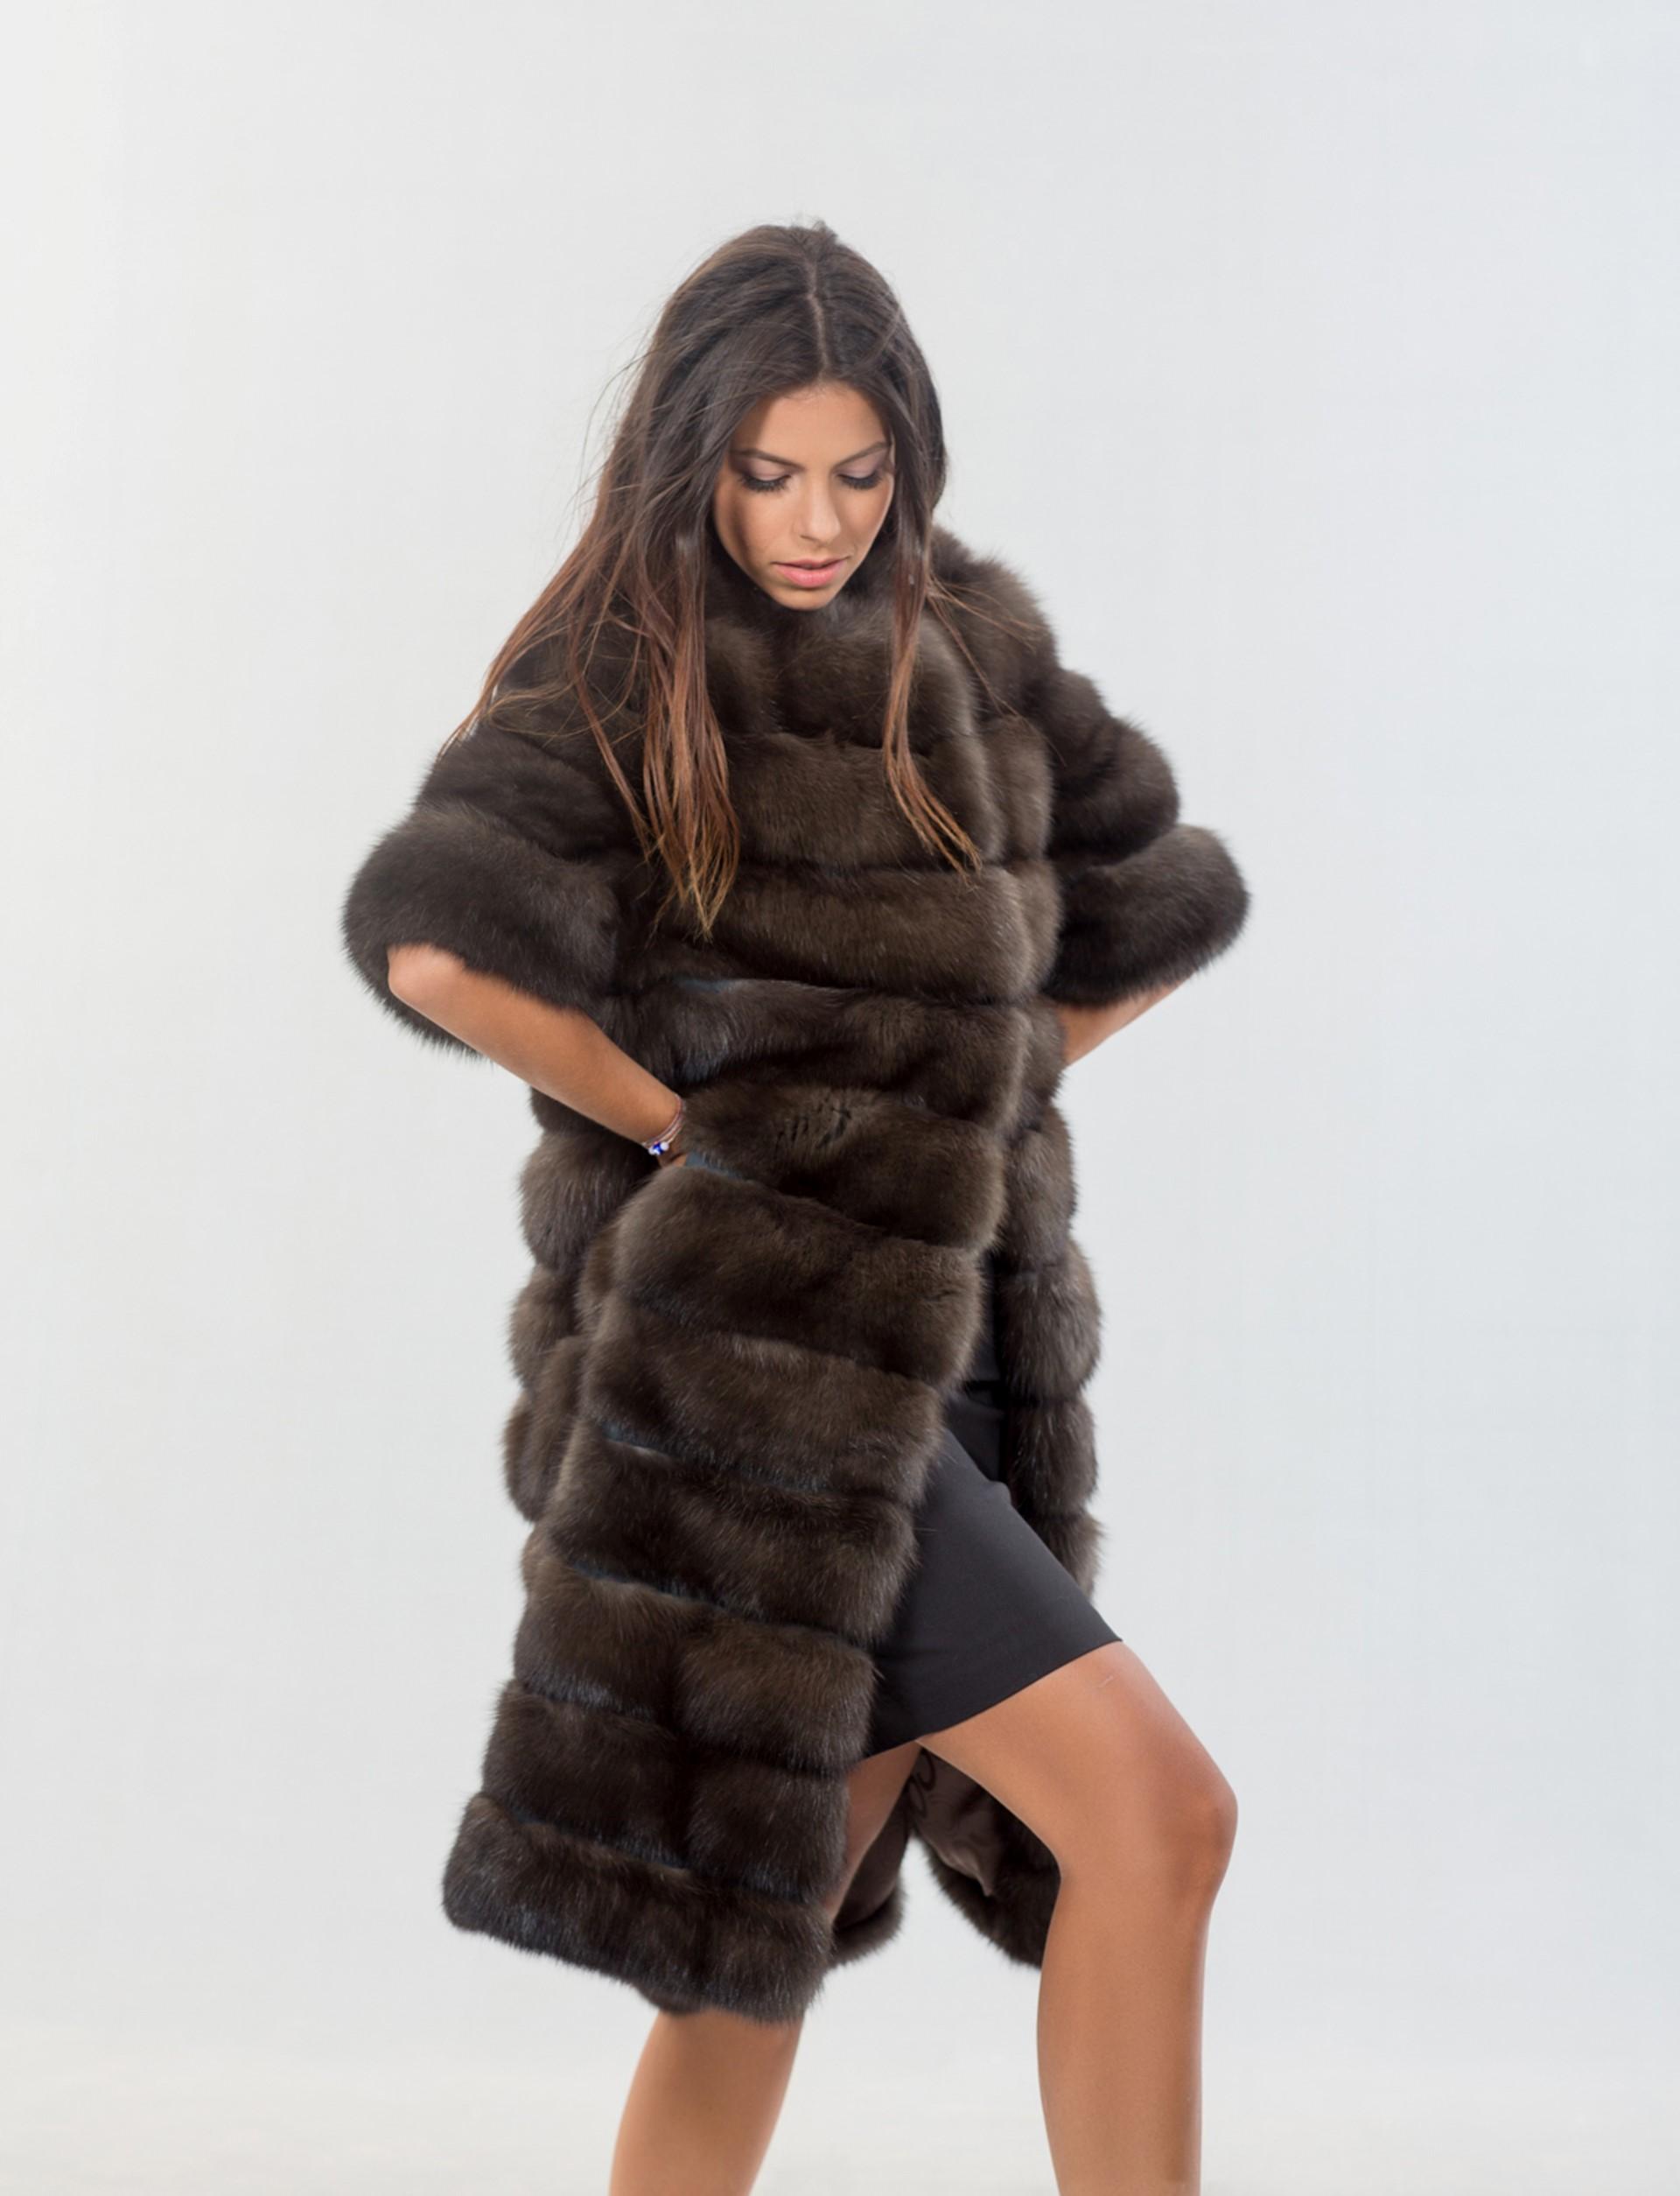 Sable Fur Coat >> Dark Skin Russian Sable Fur Coat I Classy Real Fur Coats